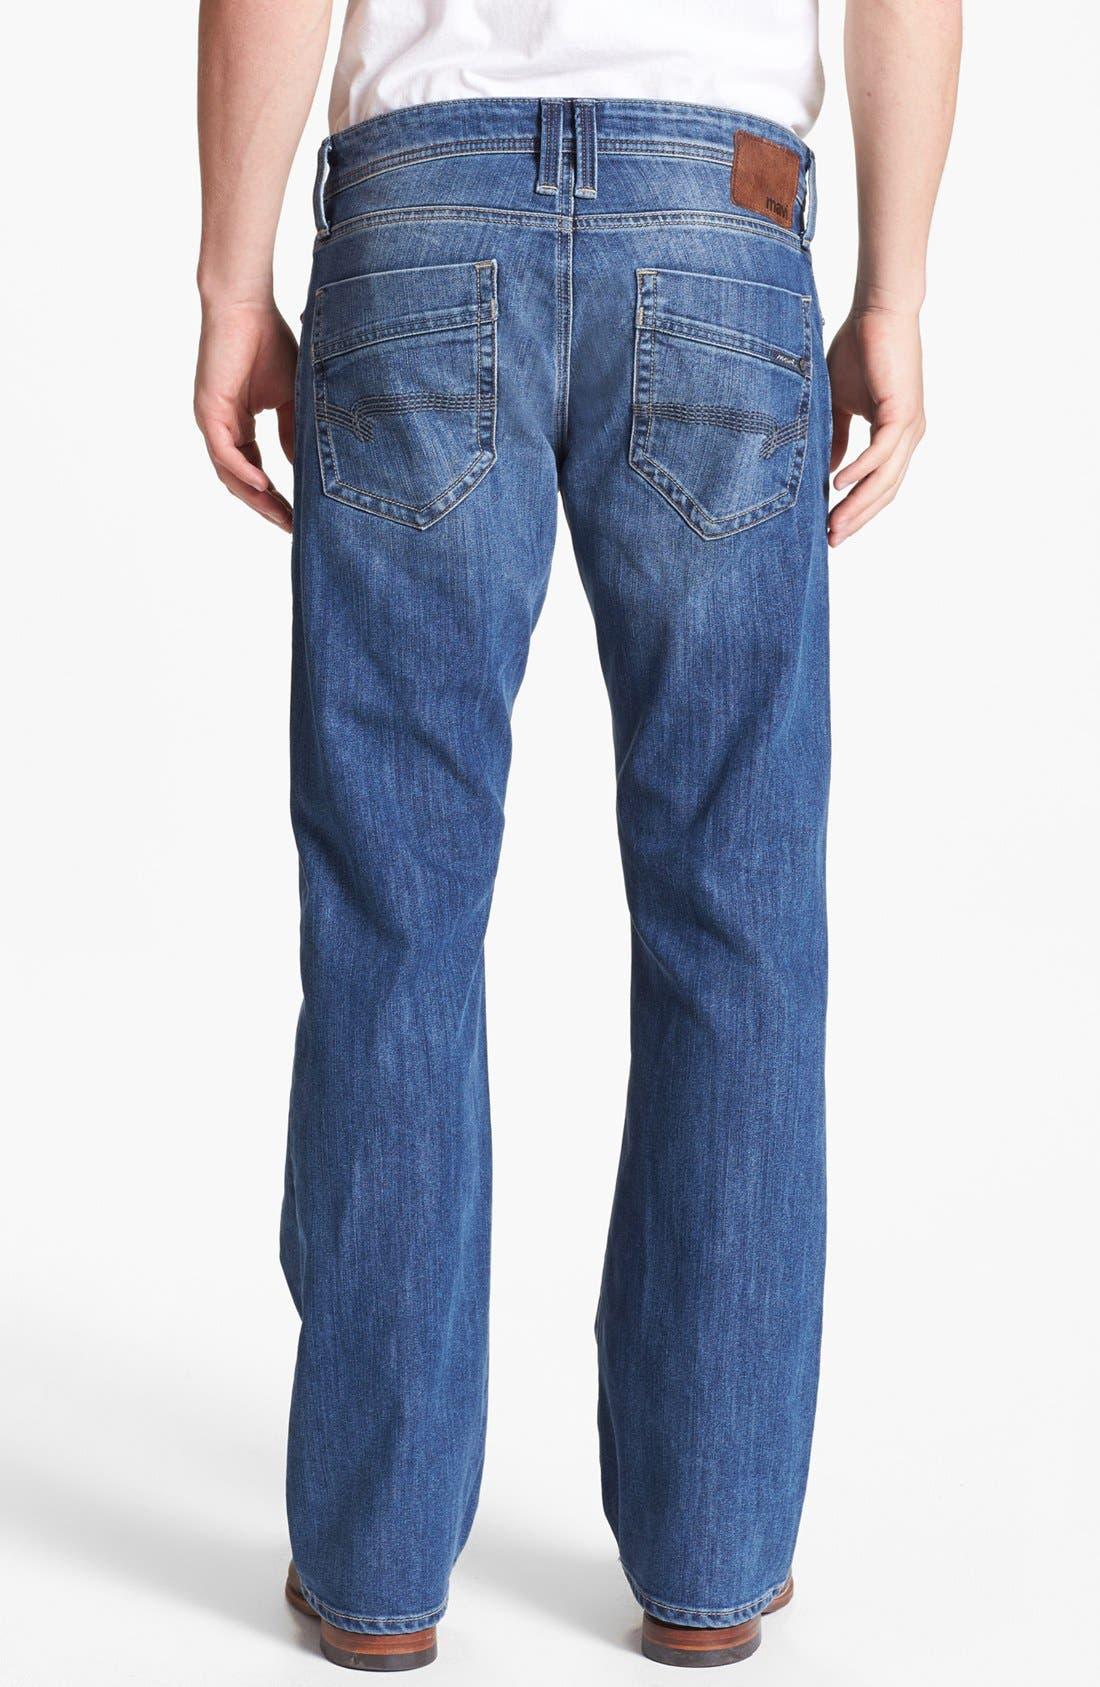 Main Image - Mavi Jeans 'Josh' Bootcut Jeans (Mid Cooper)